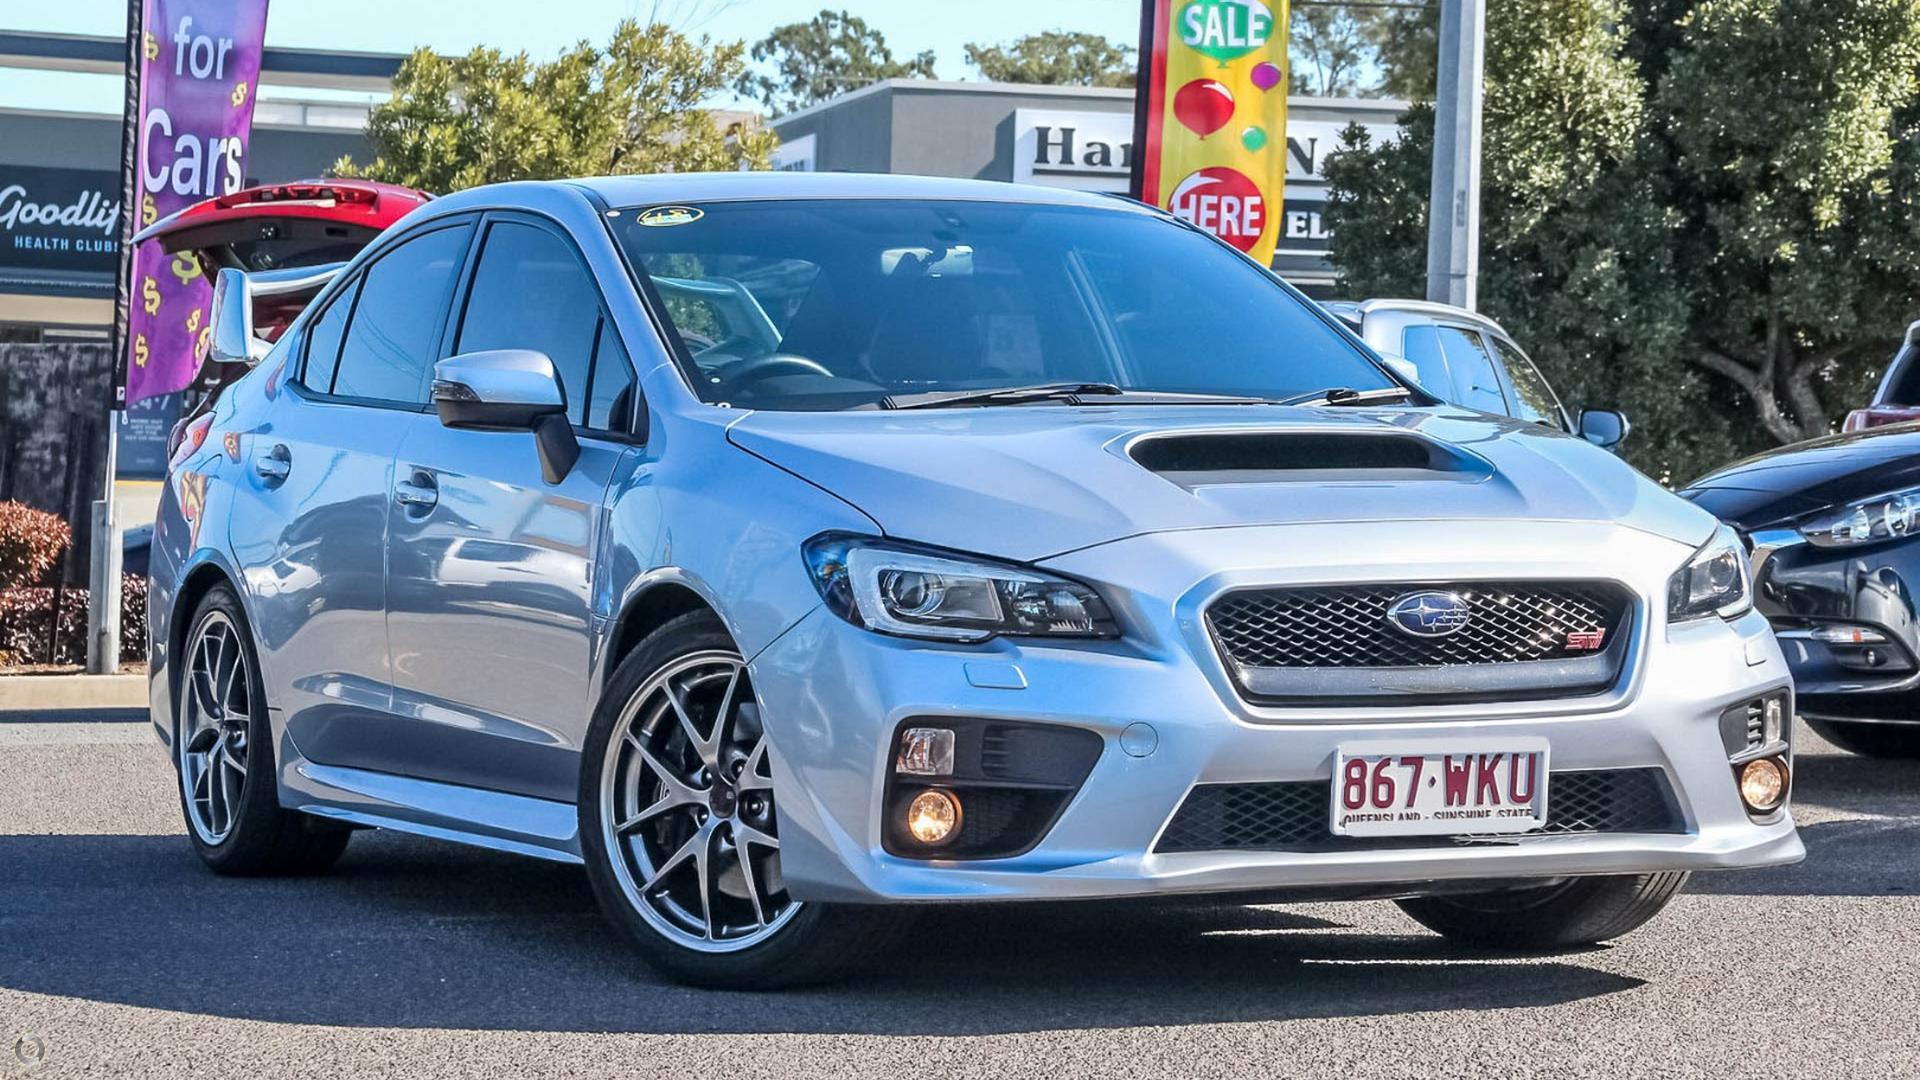 2014 Subaru Wrx Sti Premium